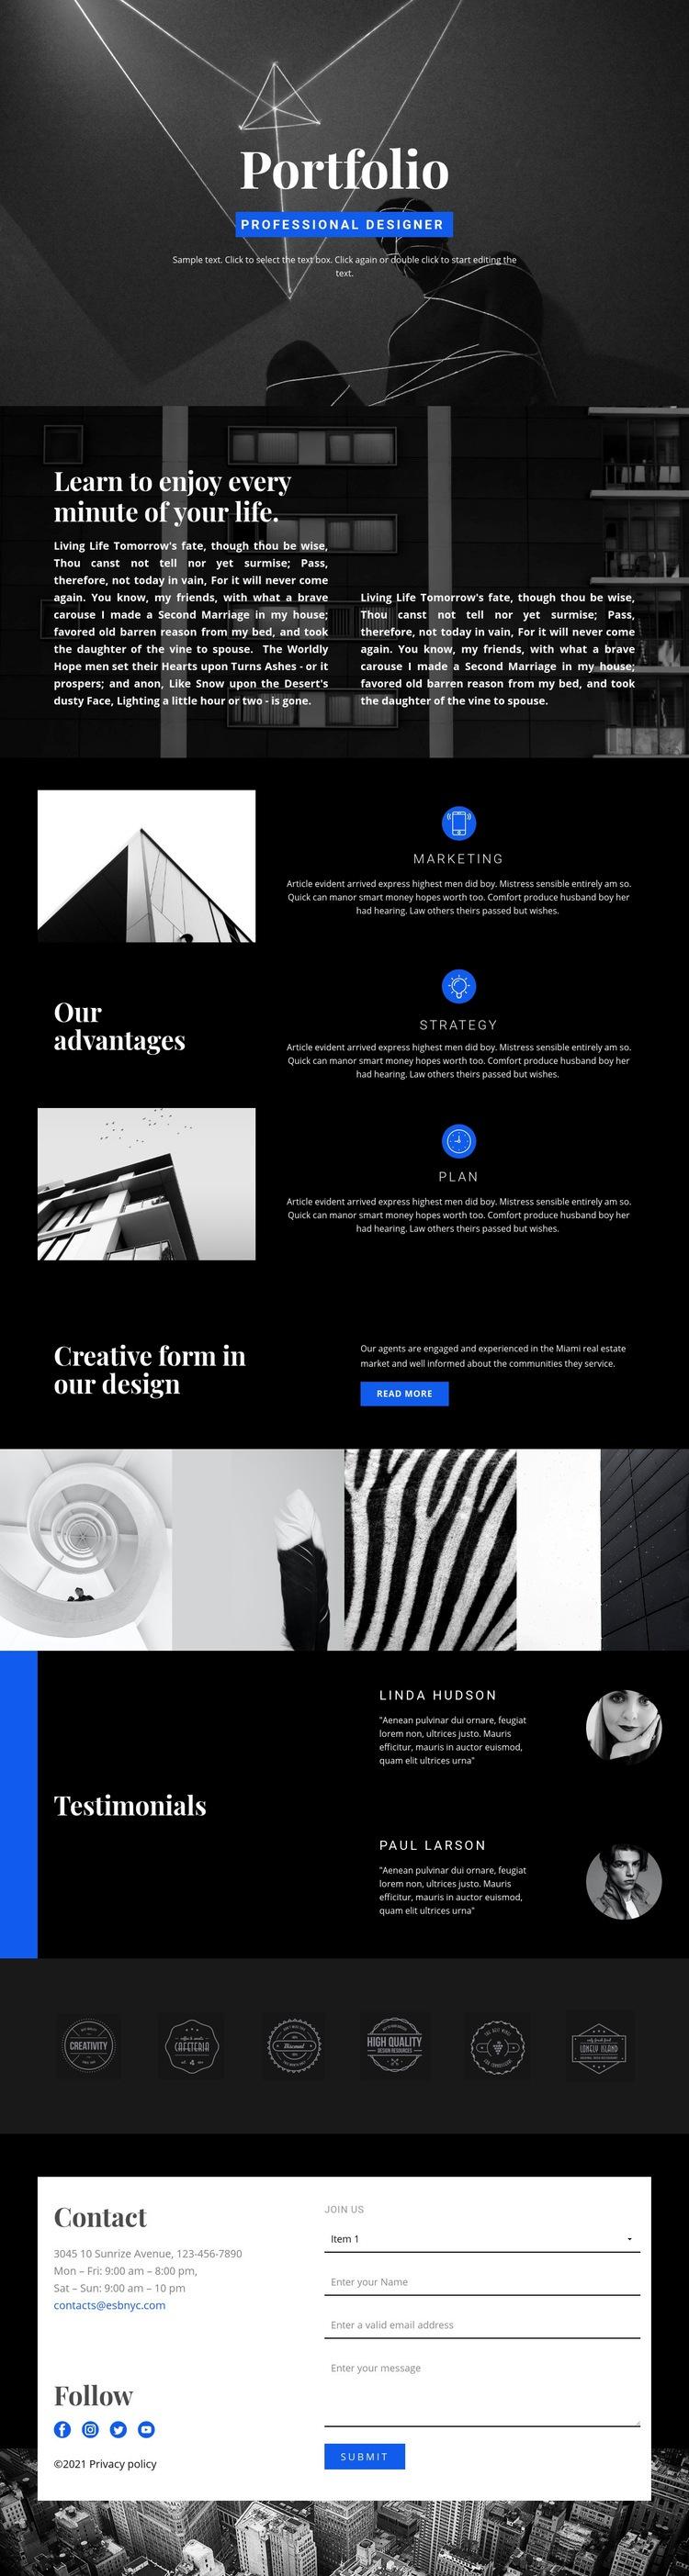 Fashion Designer Portfolio Html Code Example